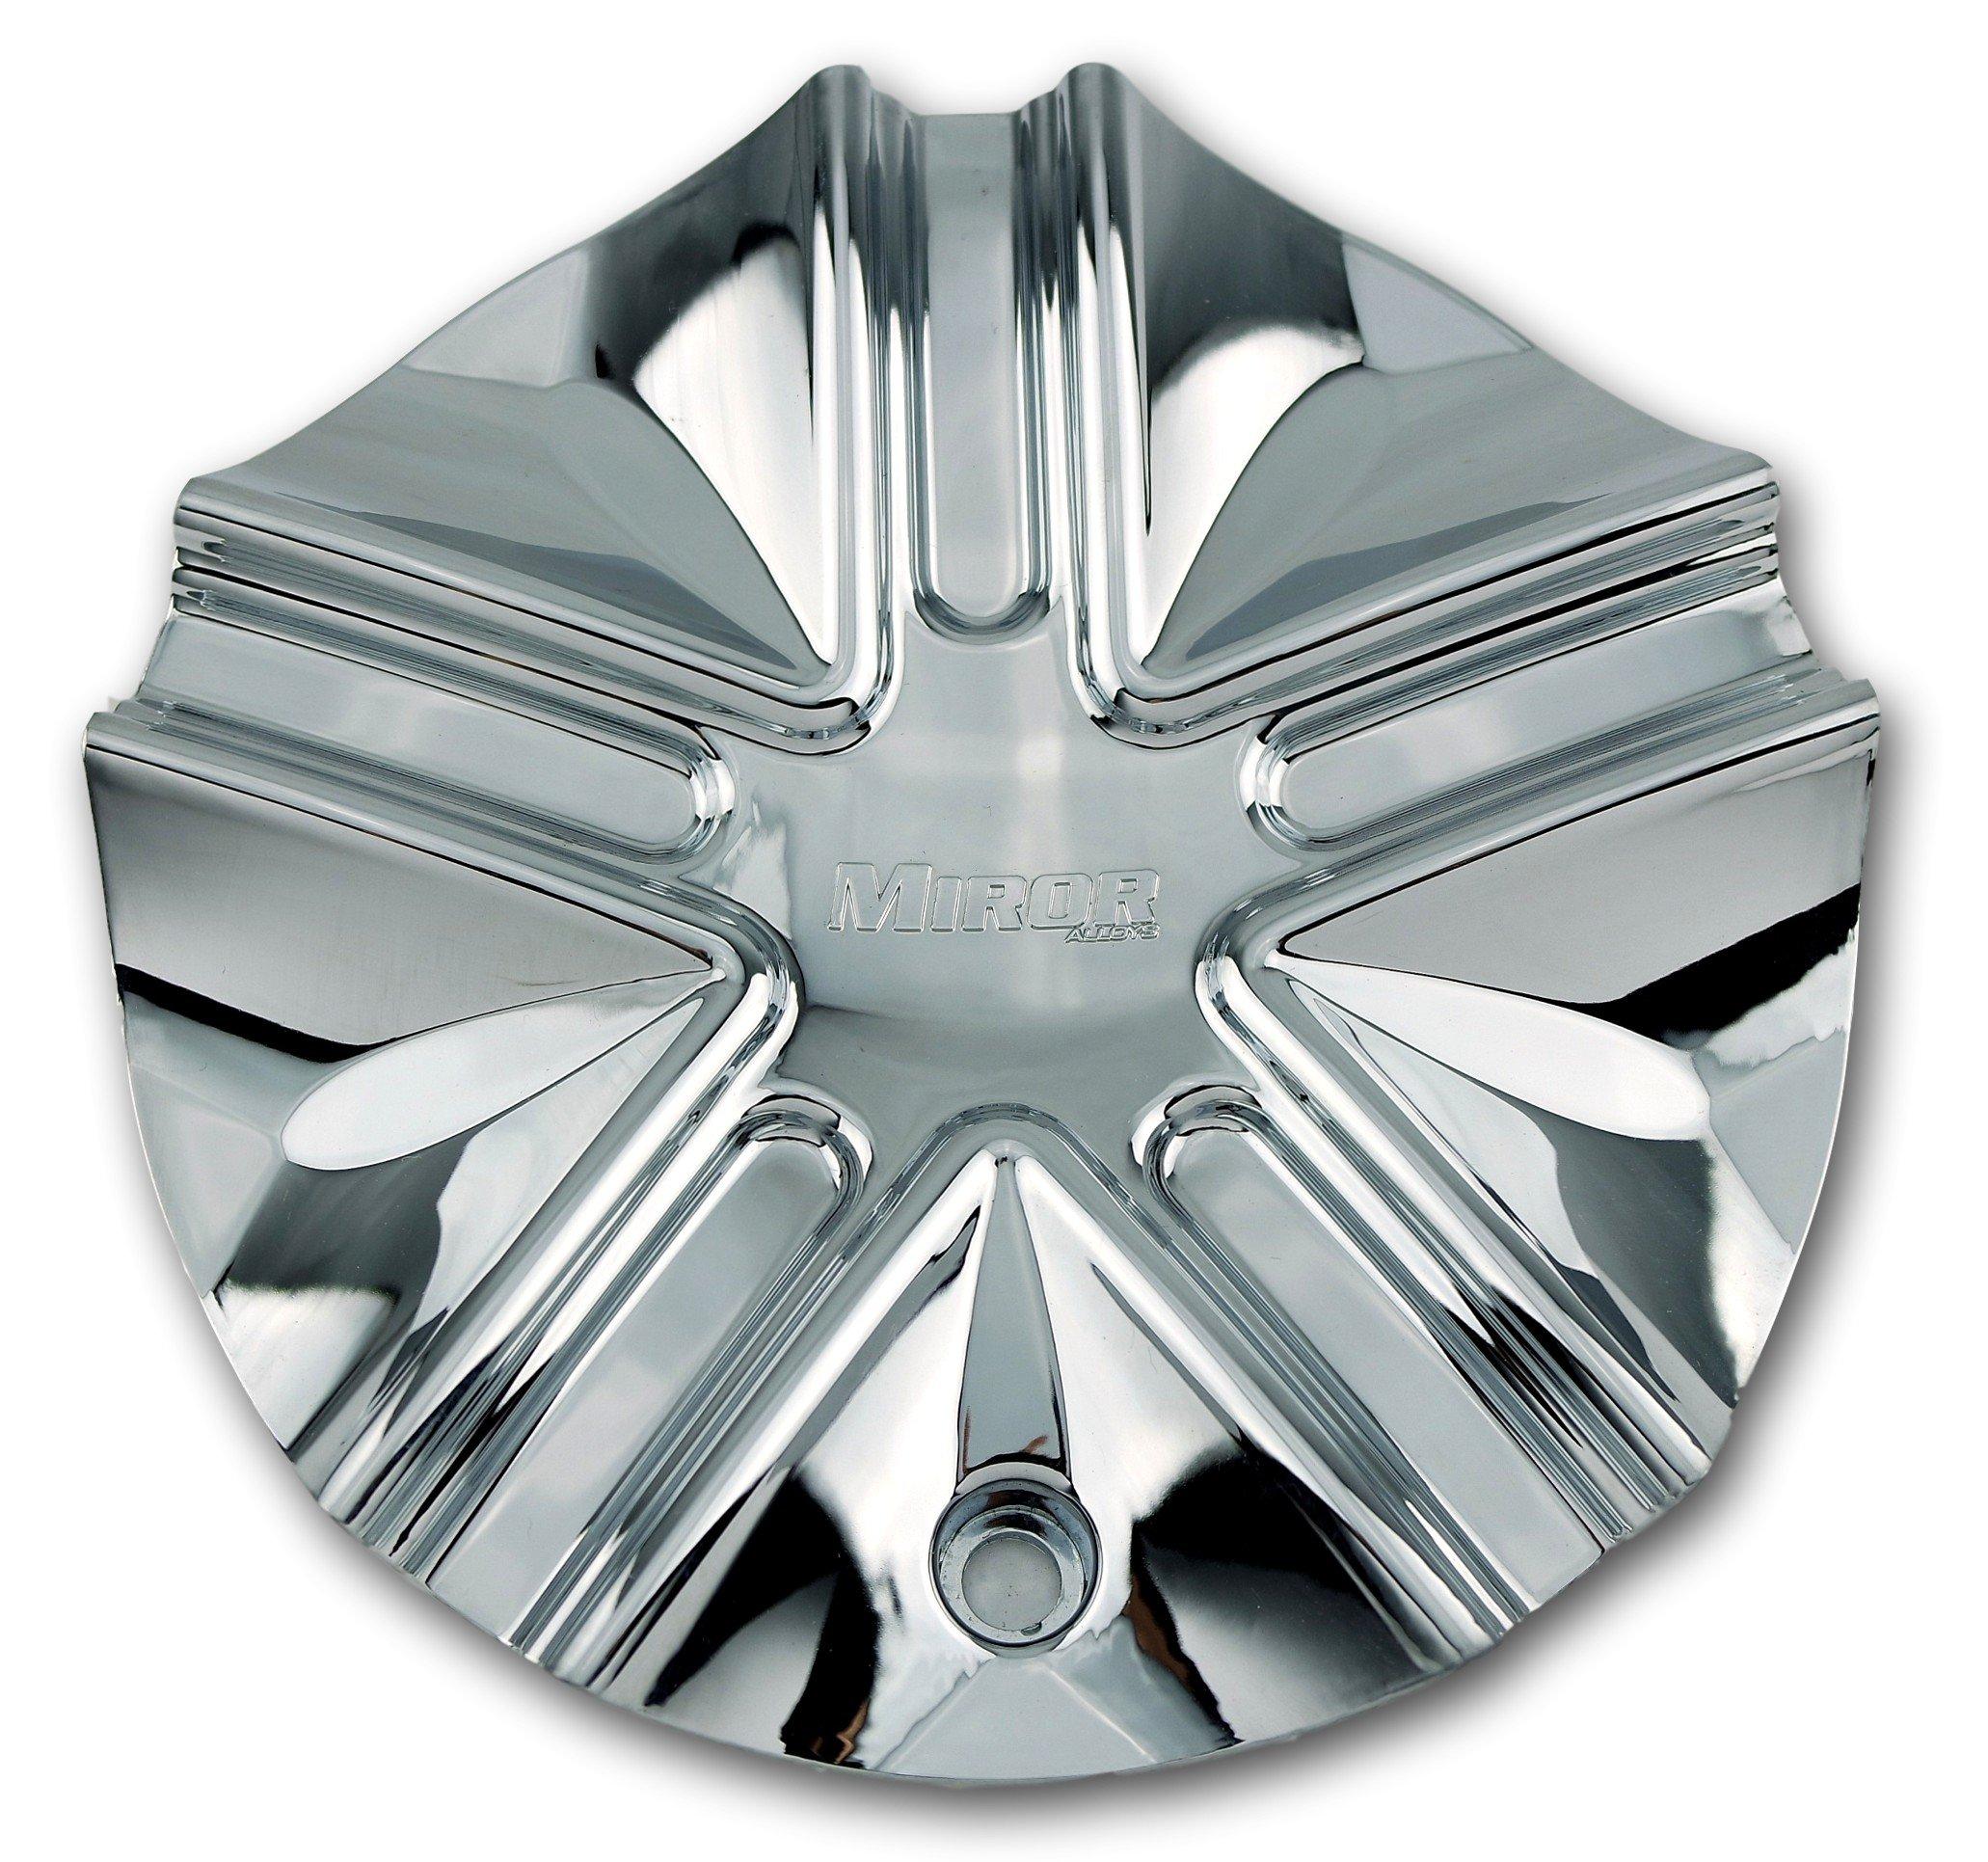 Miror Alloys Wheels Rim Center Cap CAP979L176 Chrome 6 3/4'' New